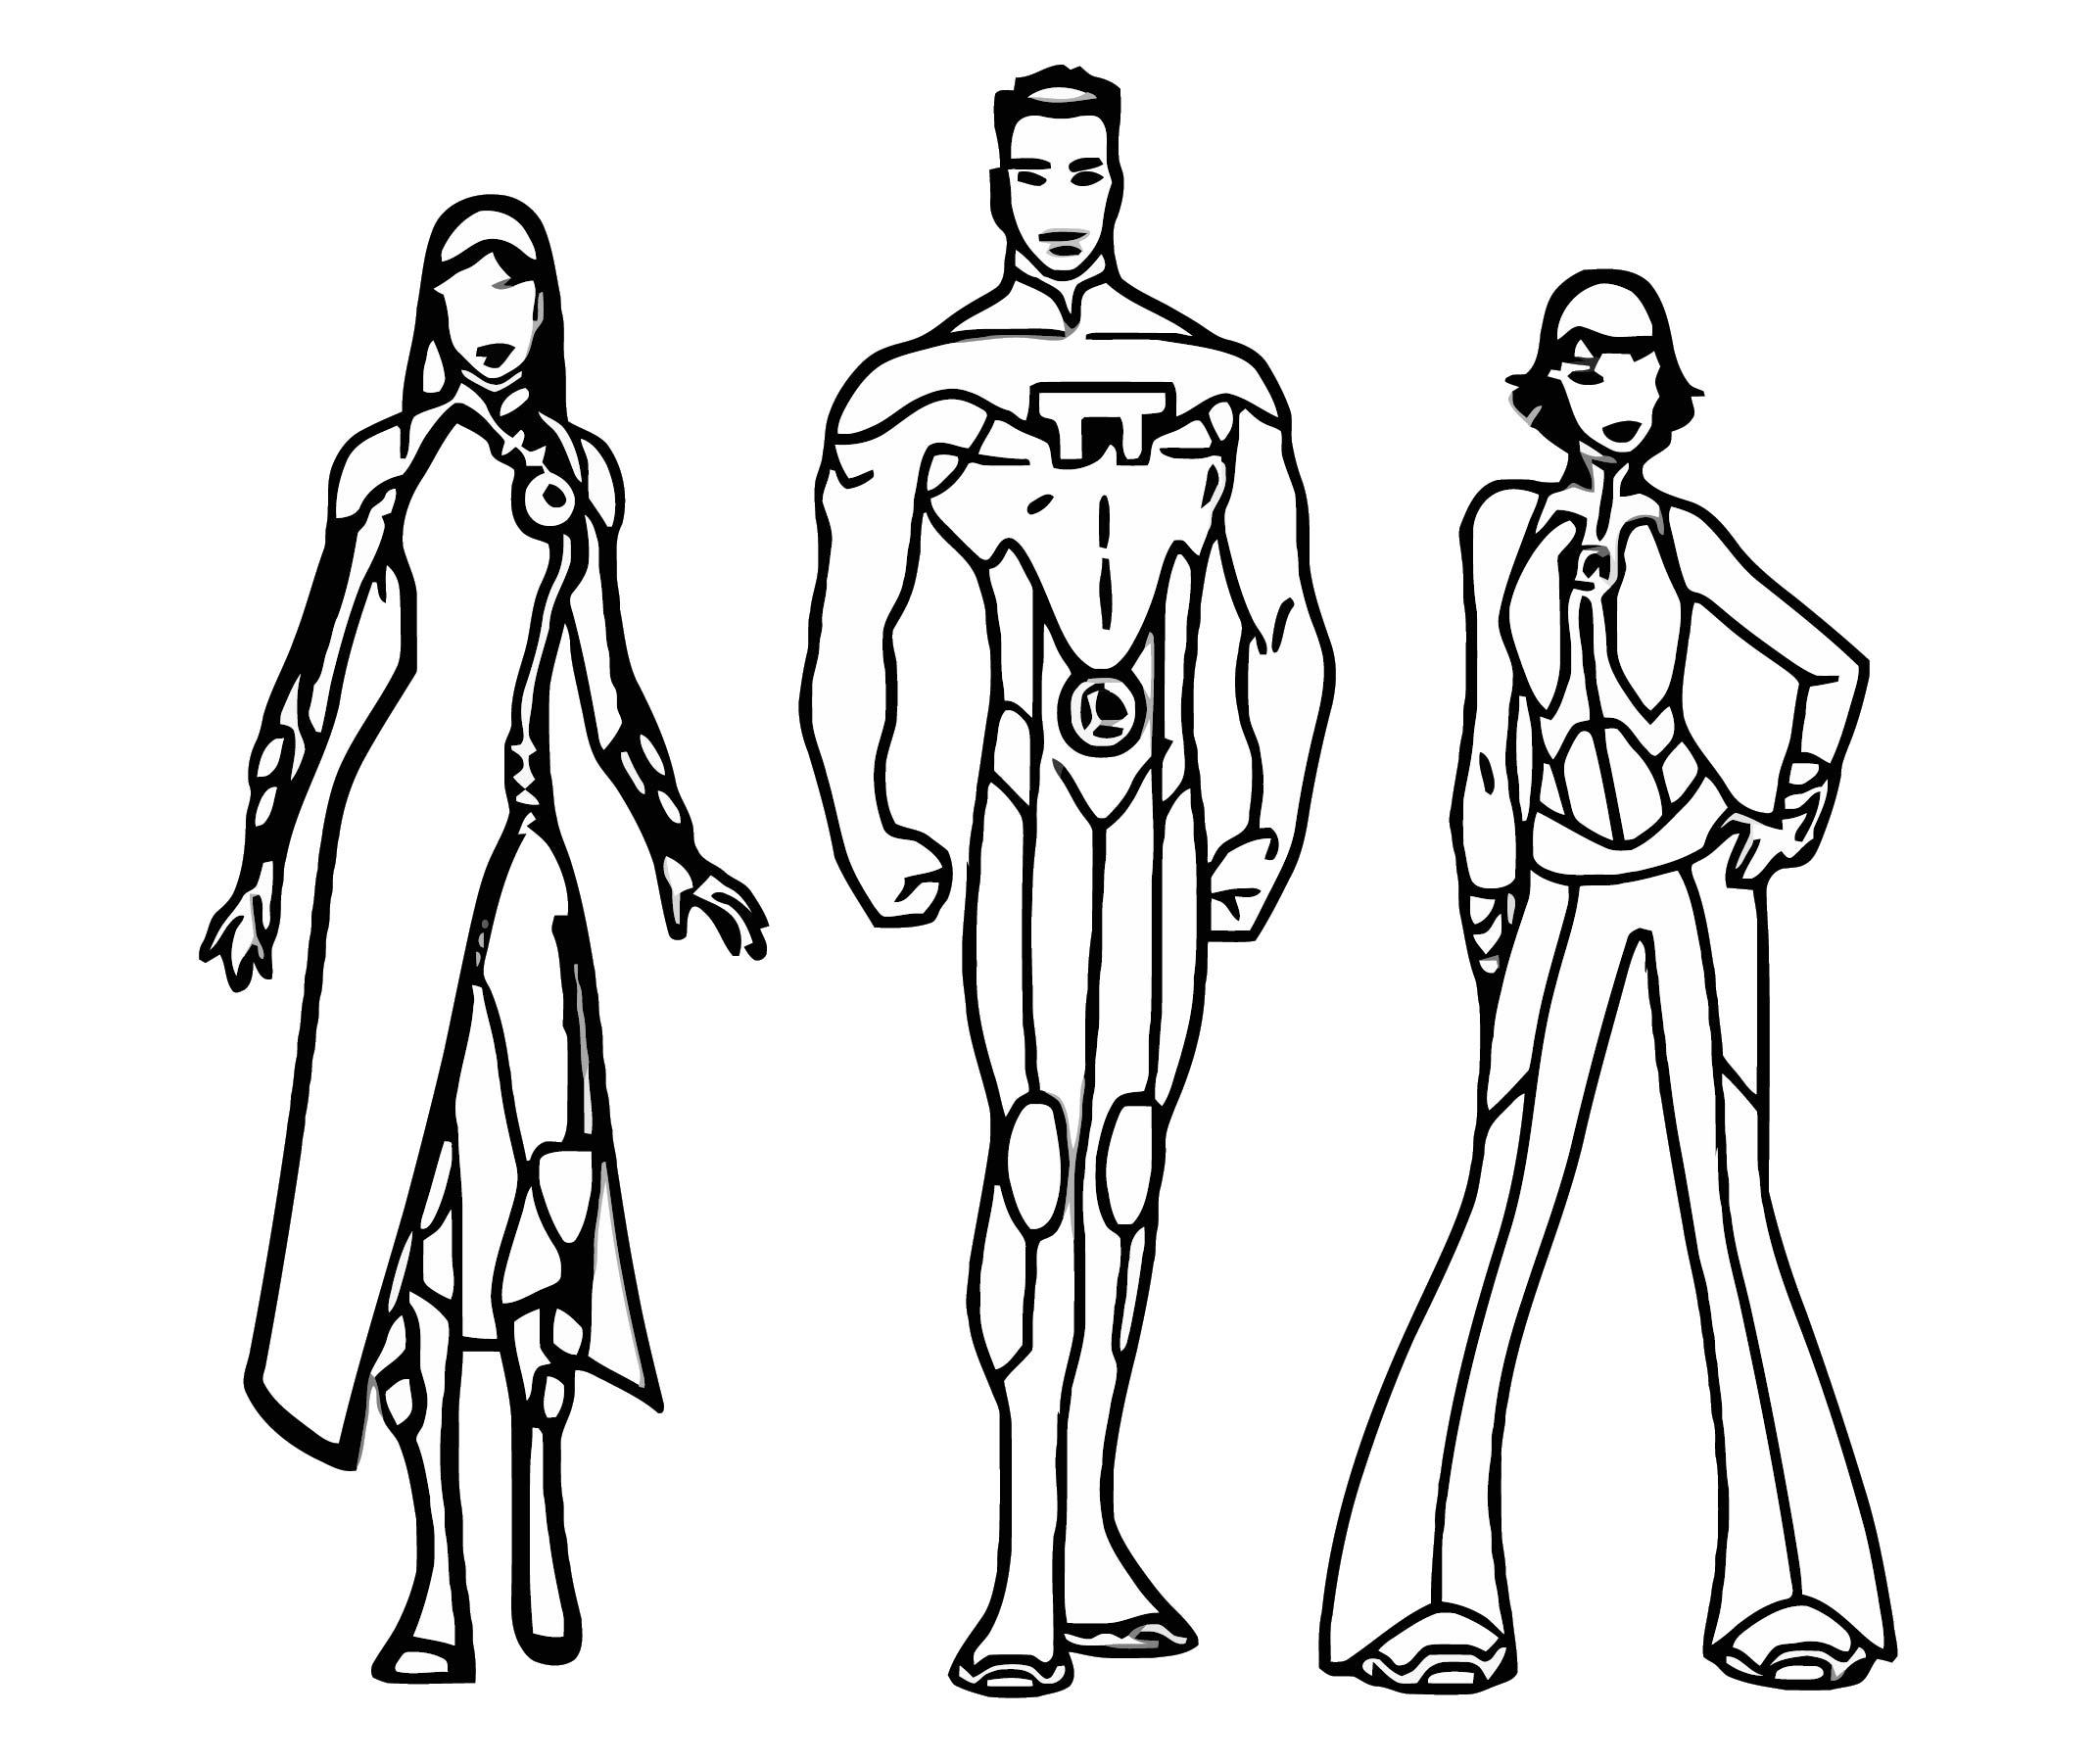 Lsh Character Design Portela D5cpaek Cartoonize Coloring Page